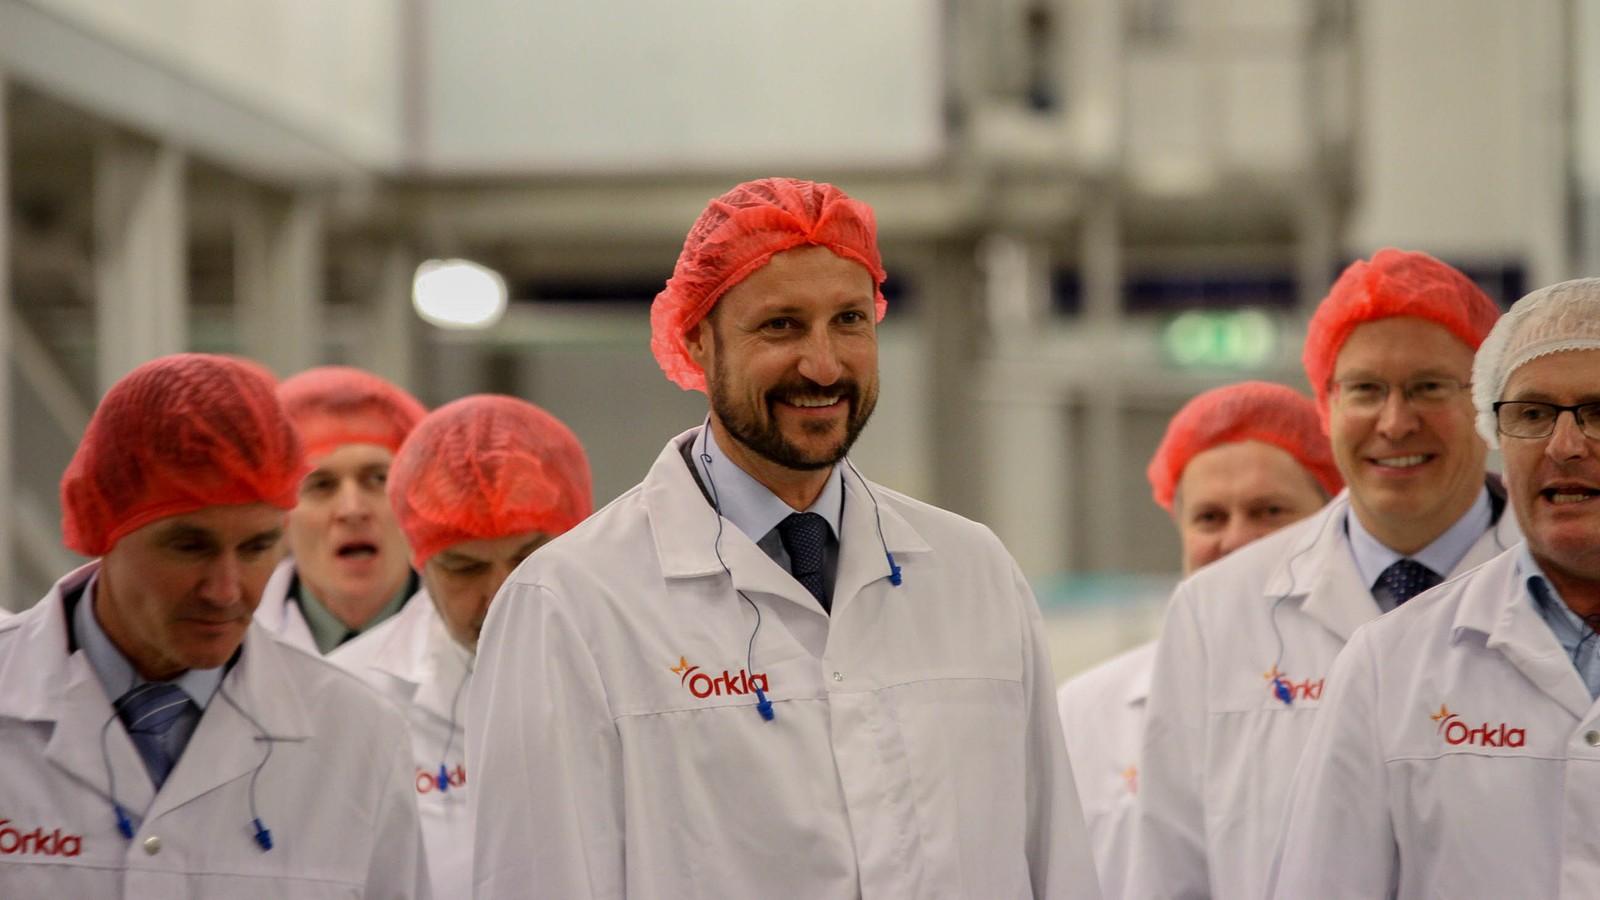 Kronprins Haakon var i godt humør og lo mye under besøket.